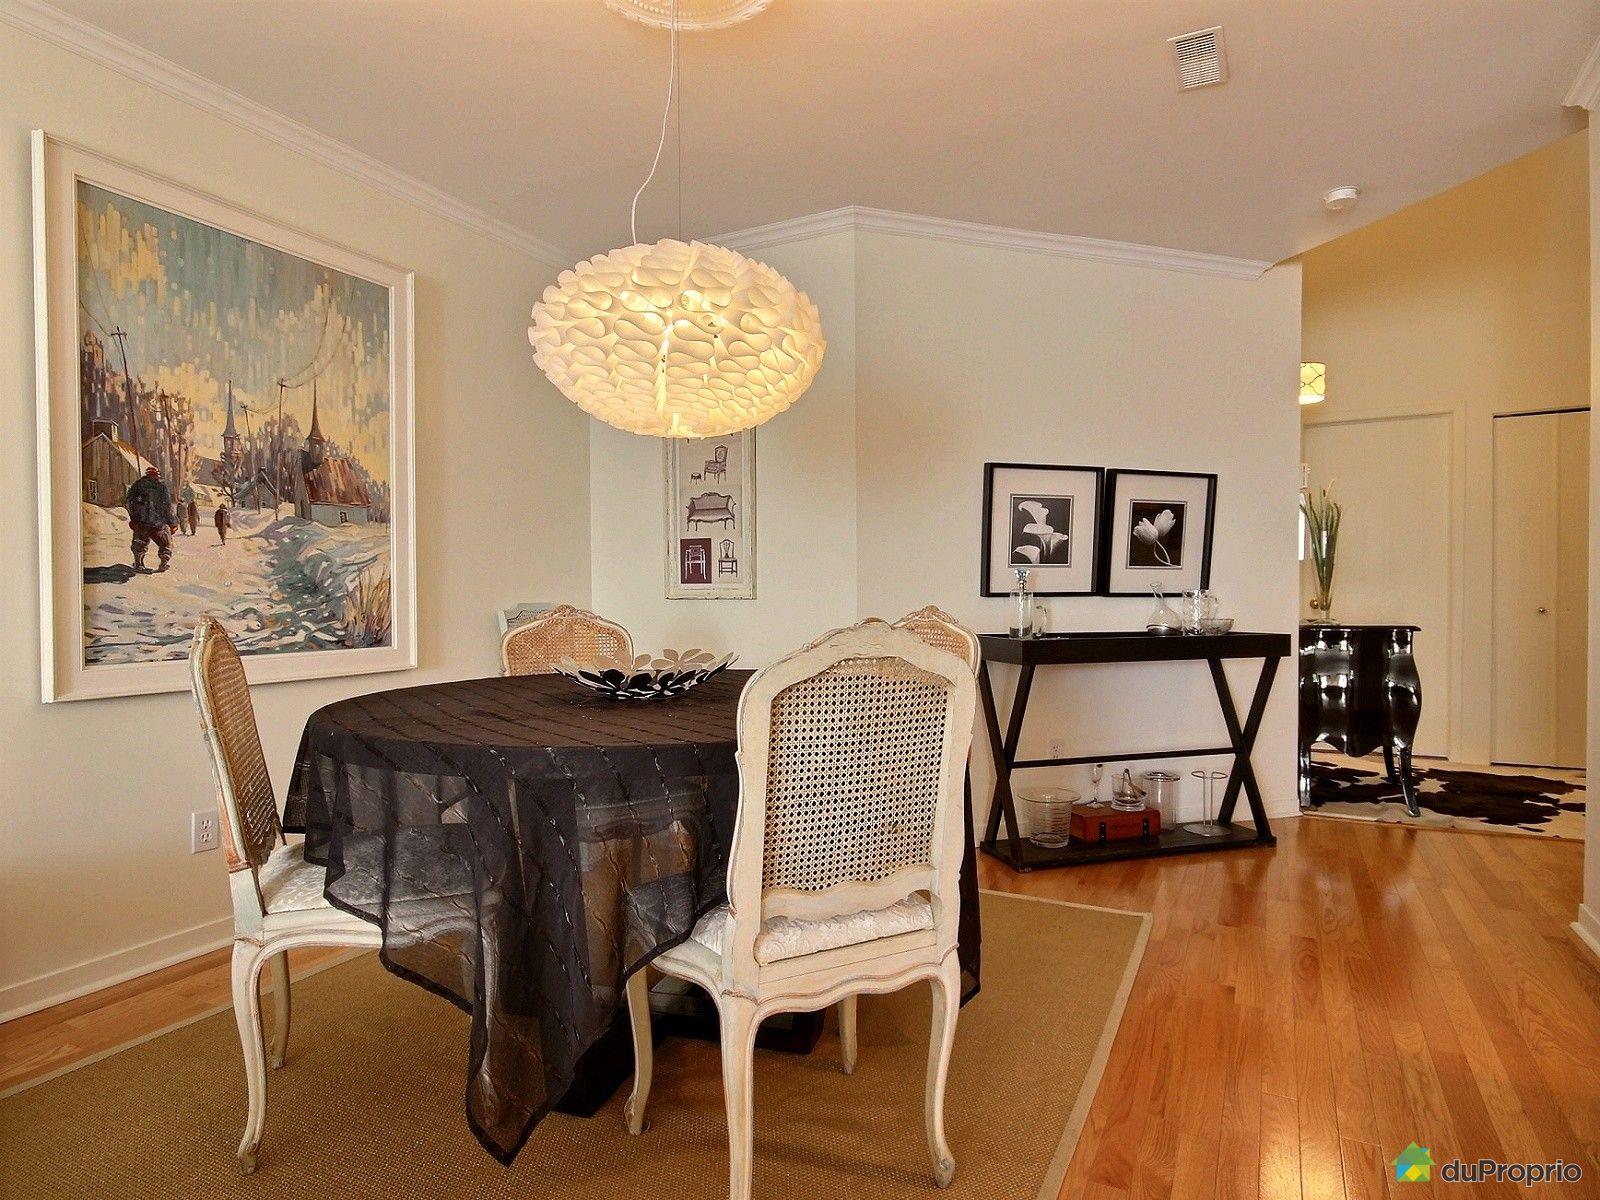 Condo vendre st lambert 646 place de namur immobilier for Salle a manger namur